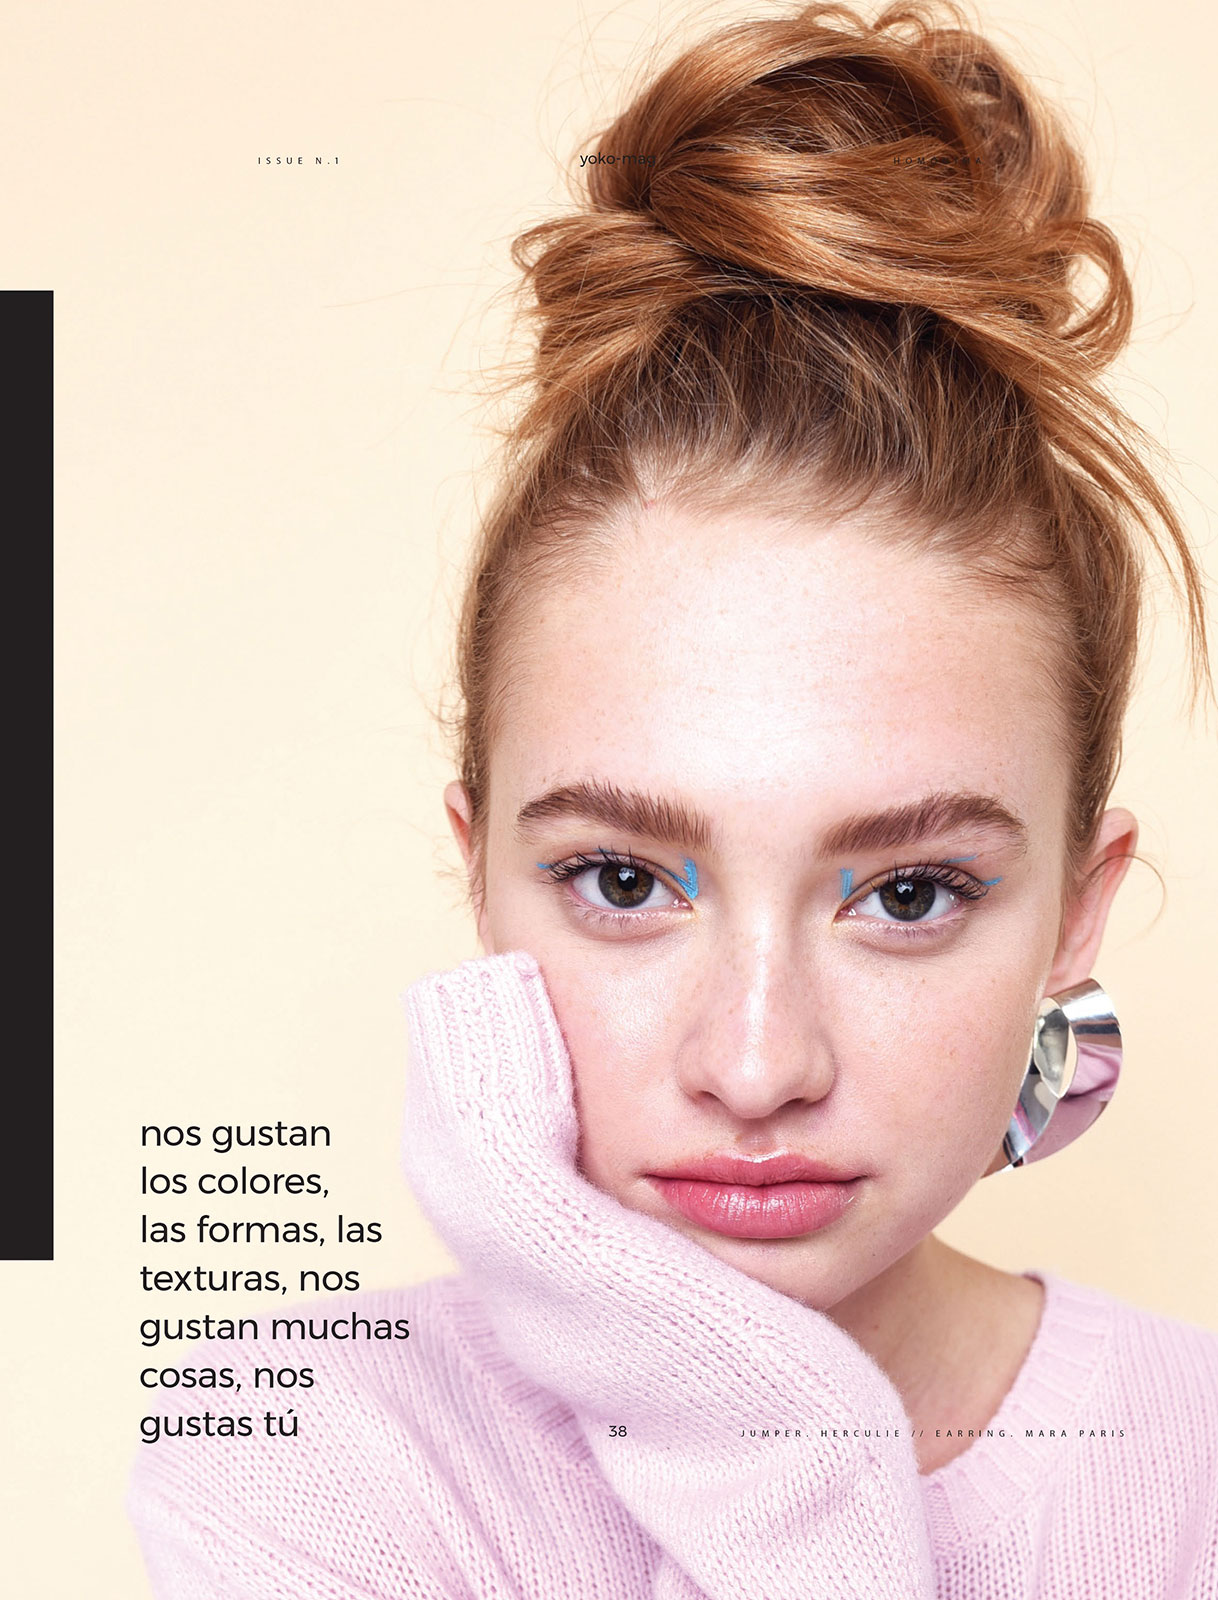 Yoko Magazine - In the mood. We have a major coup de cœur